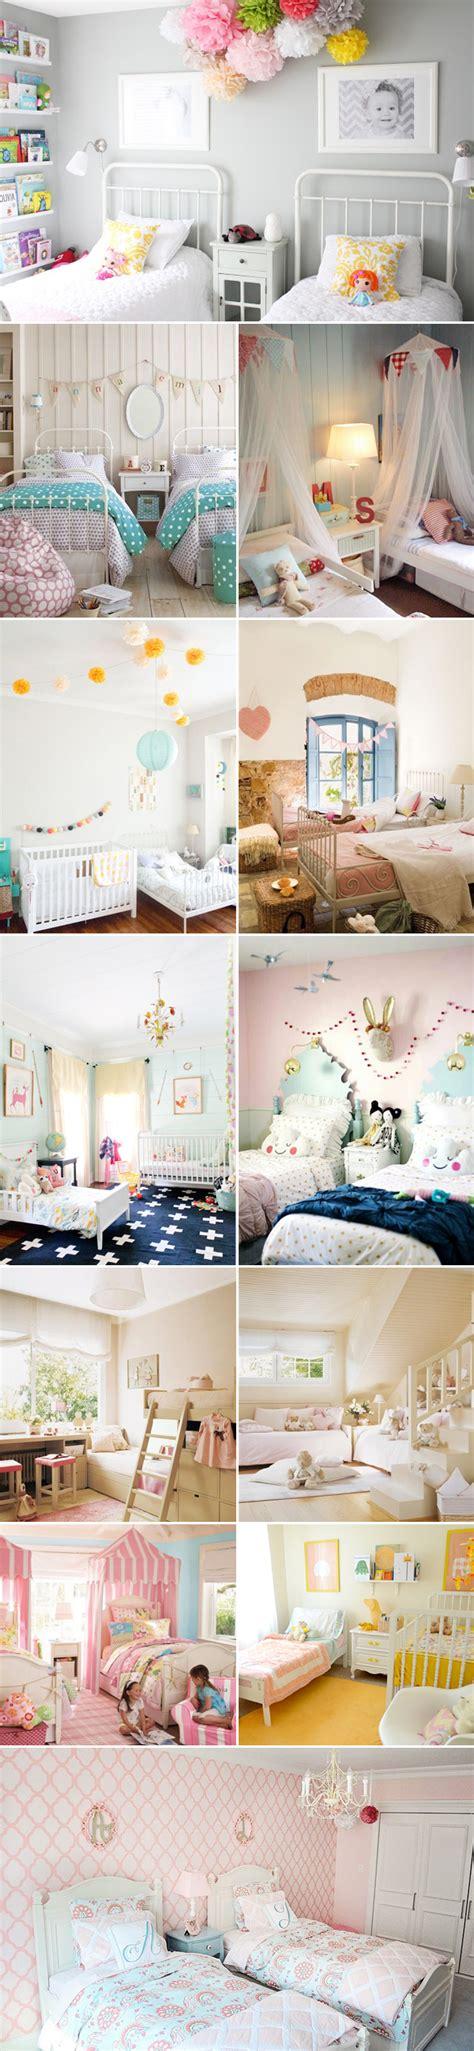 kids shared bedroom ideas 29 shared bedrooms ideas for children praise wedding